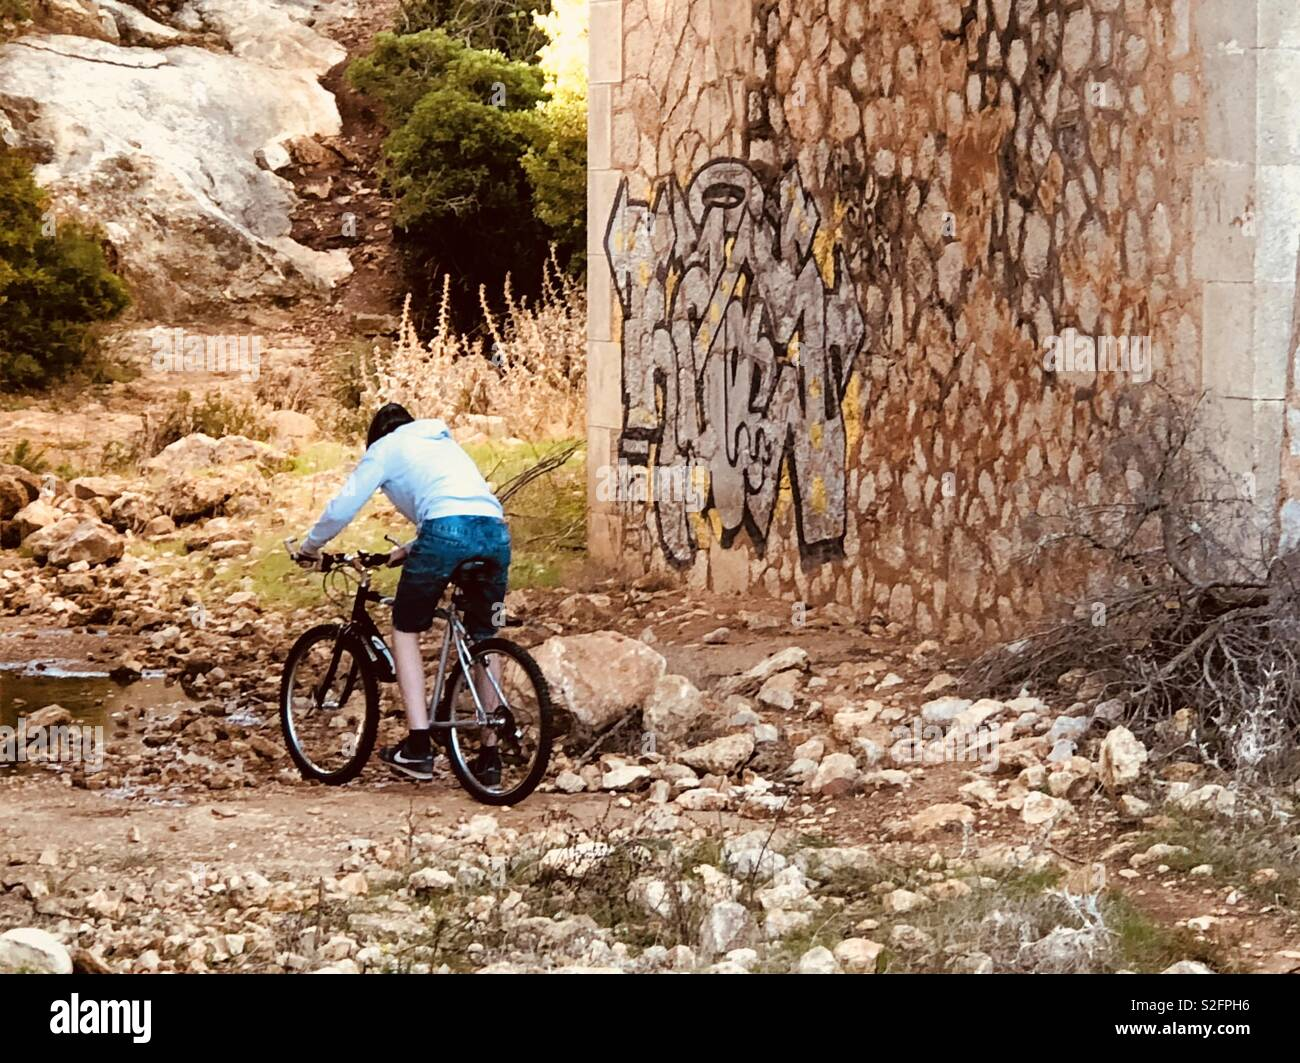 Cyclist on dirt trail under bridge - Stock Image